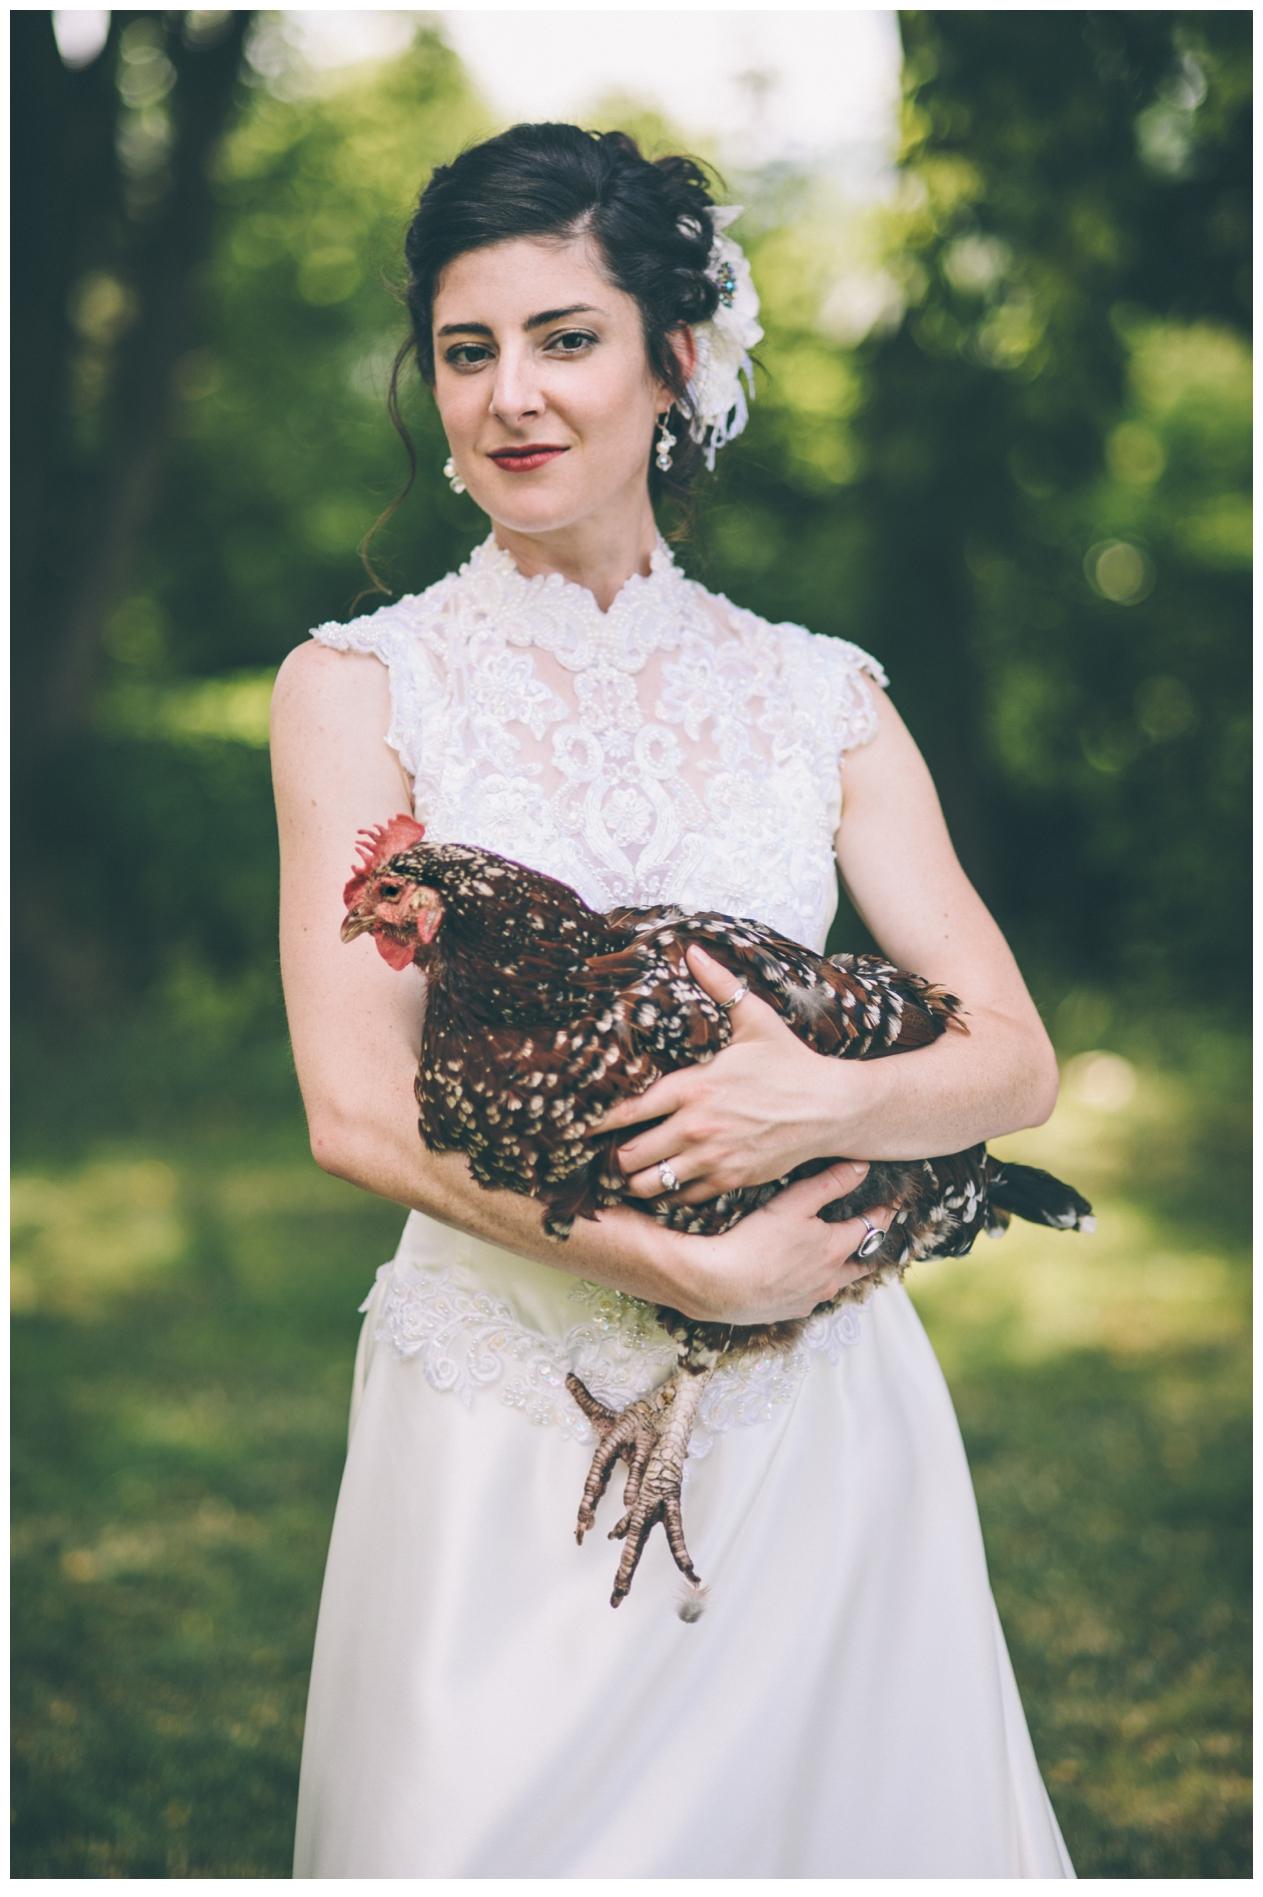 026-AmandaKoppImages-Colorado-Farm-Wedding-Photo.jpg